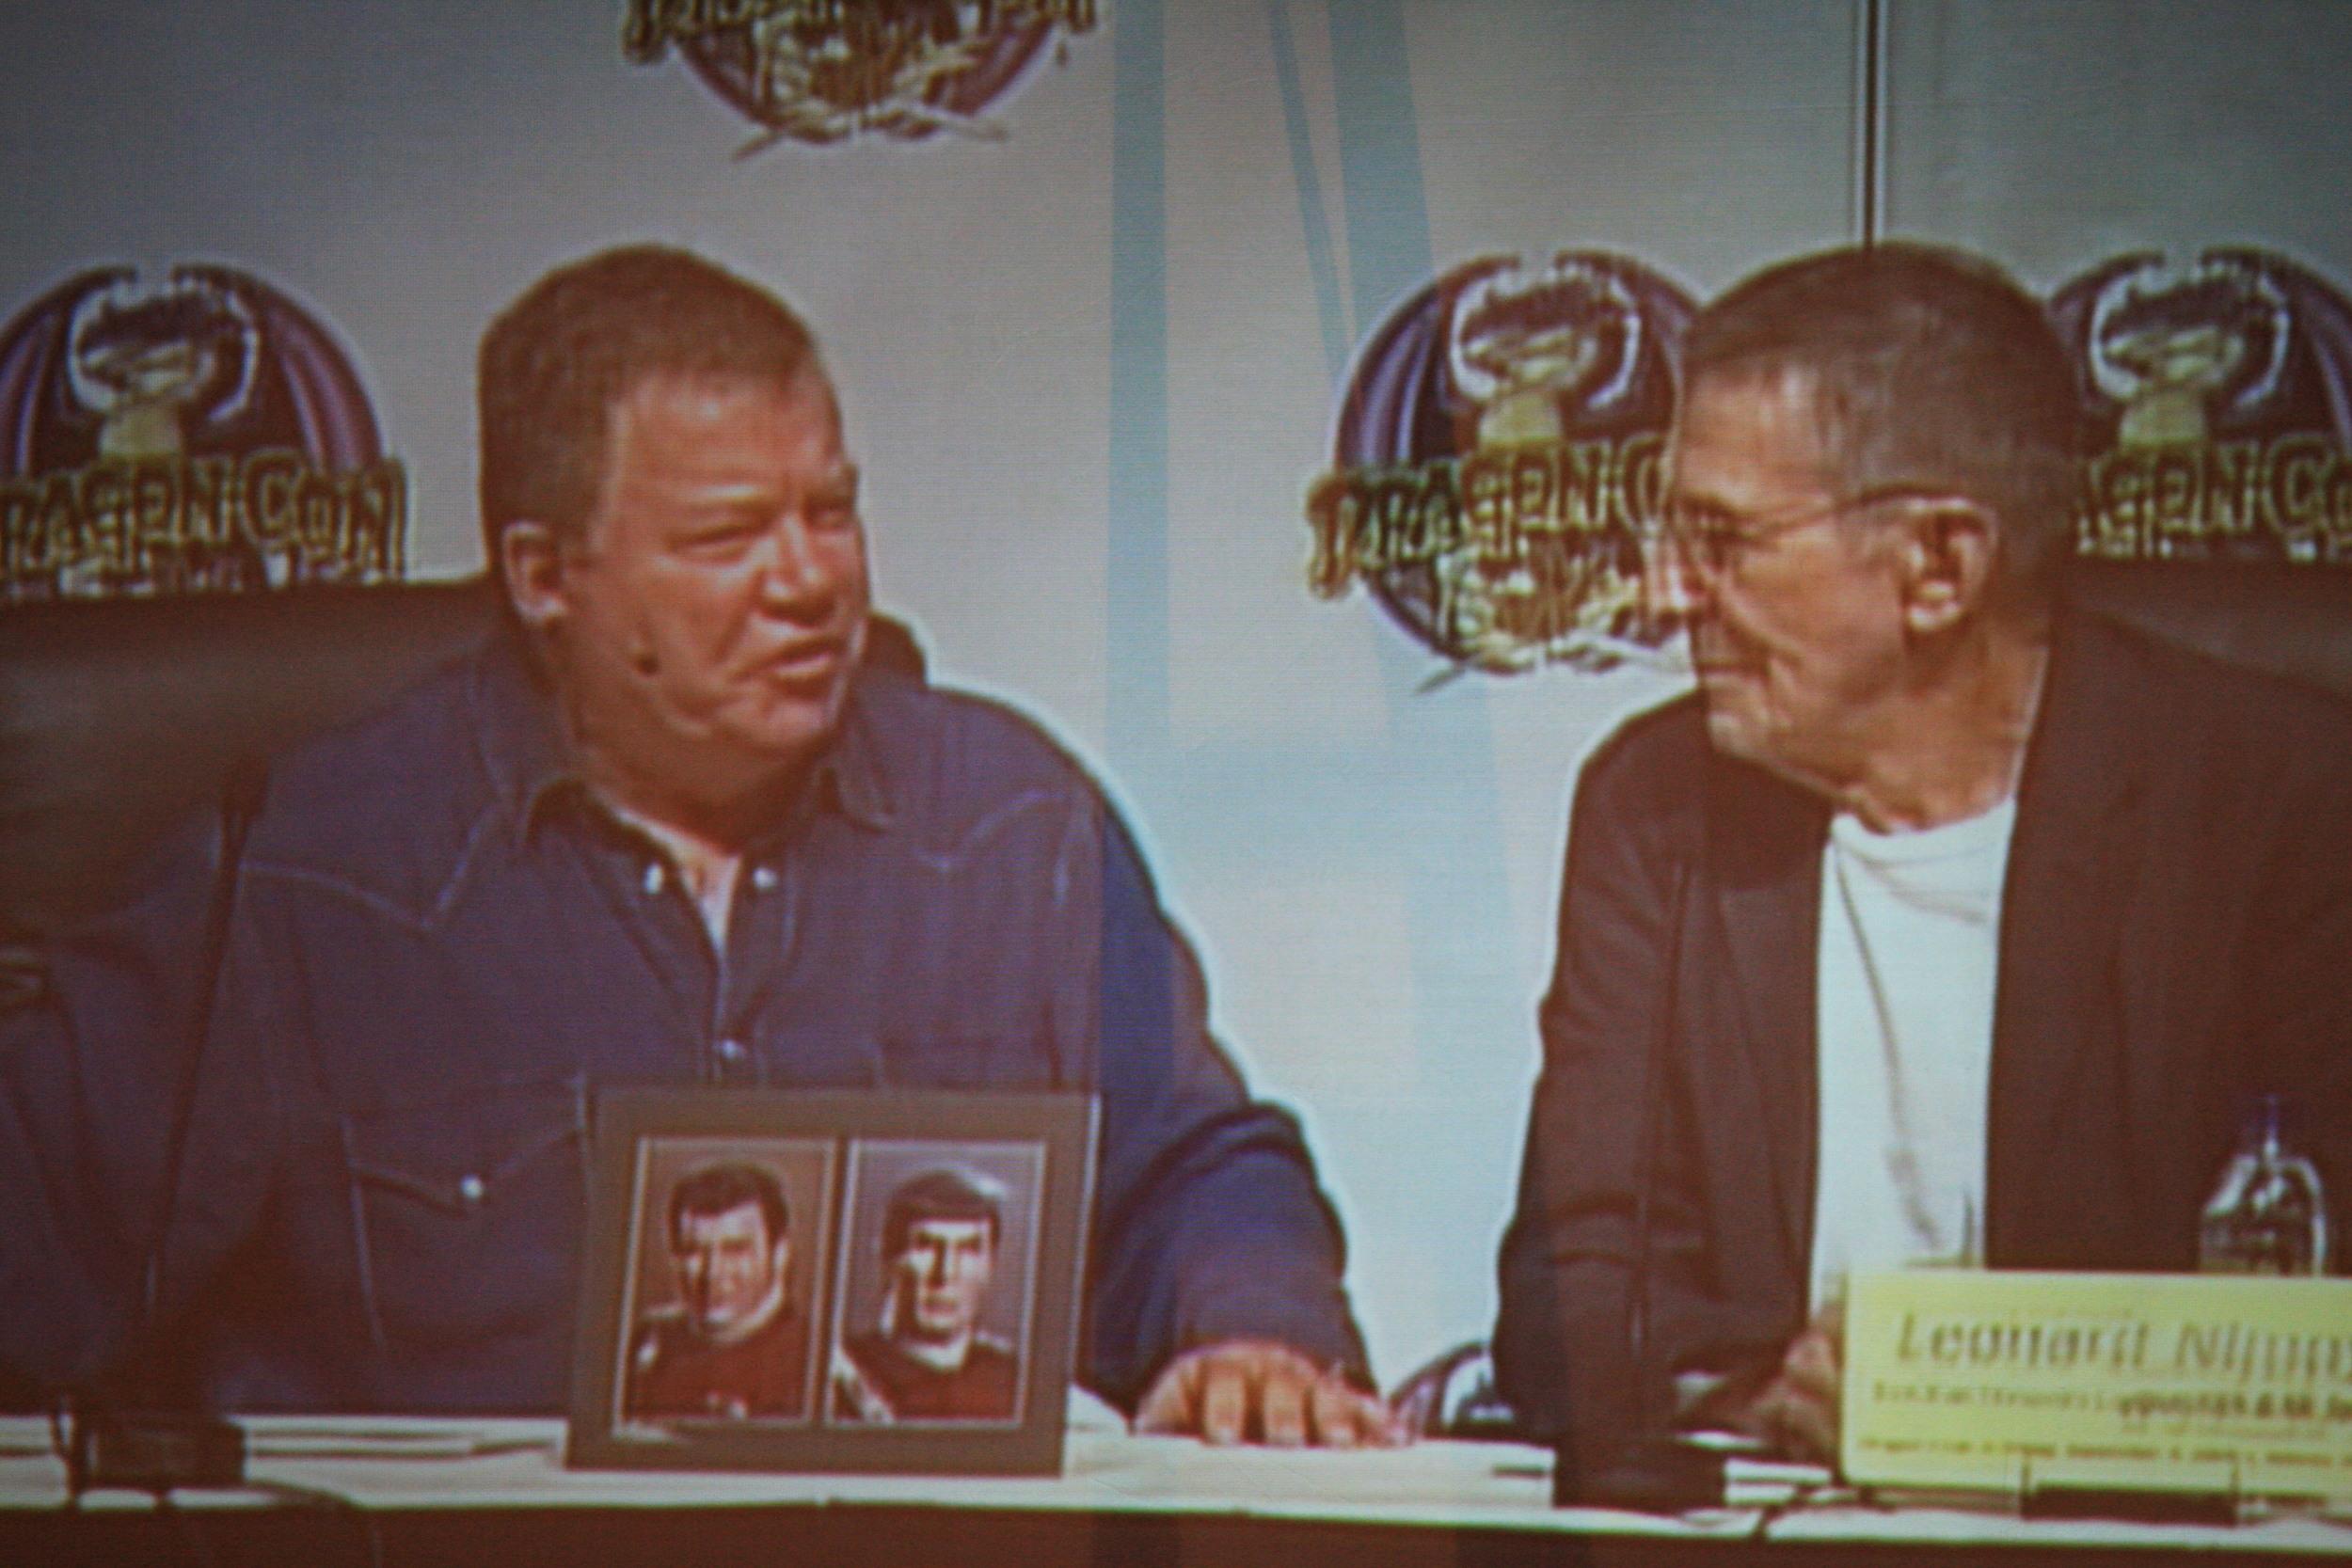 Nimoy and Shatner